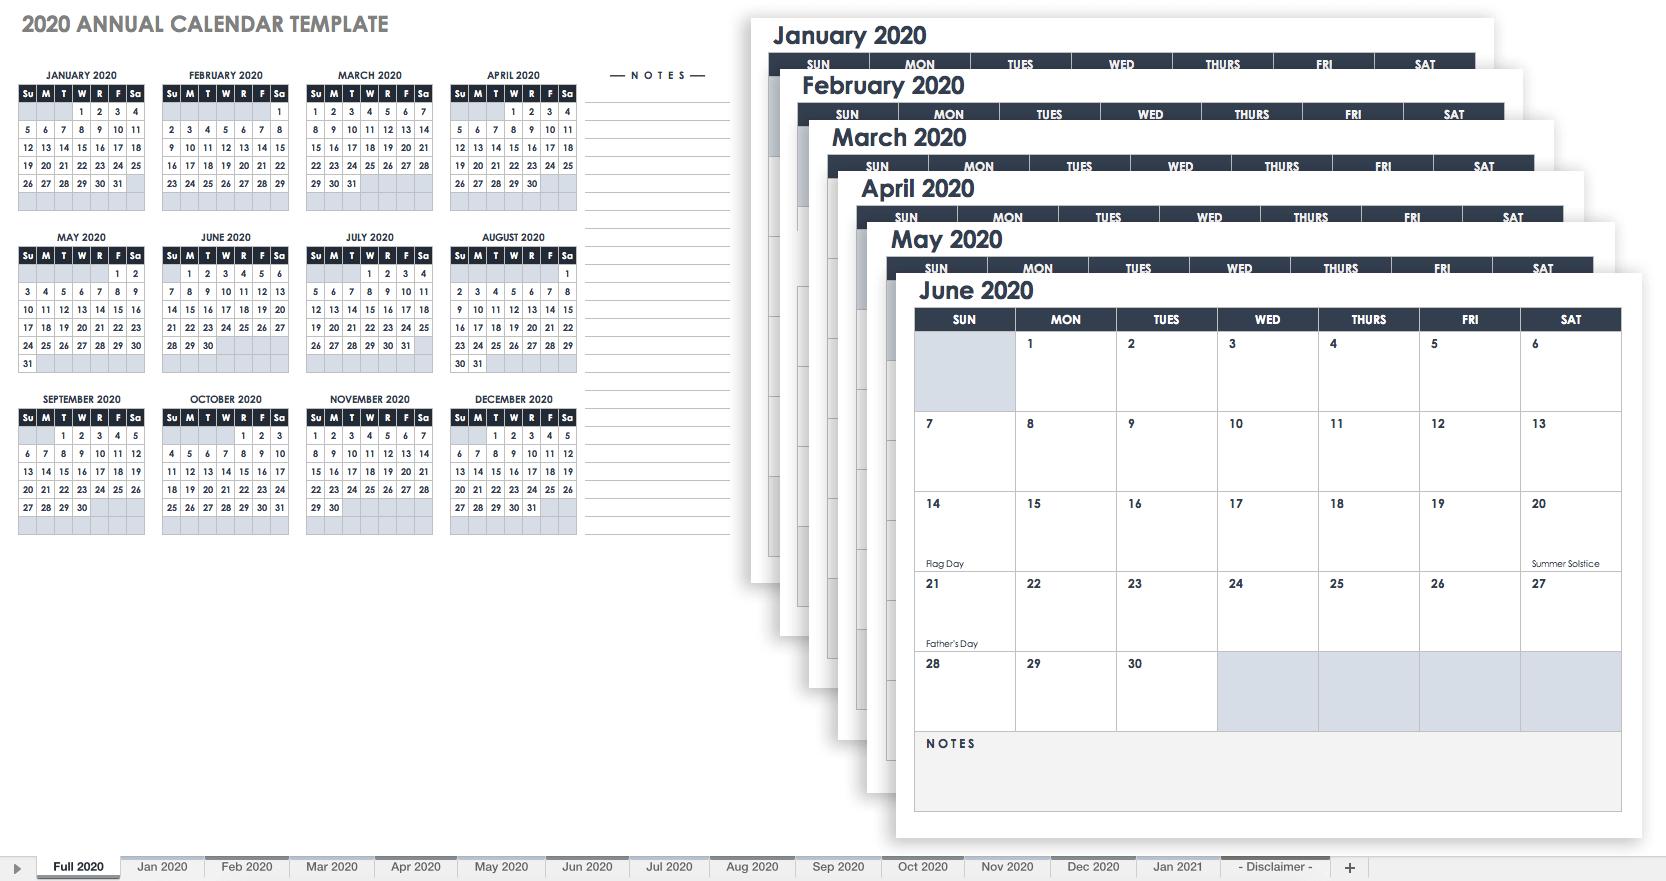 Free, Printable Excel Calendar Templates For 2019 & On   Smartsheet Calendar 2019 Excel Pakistan